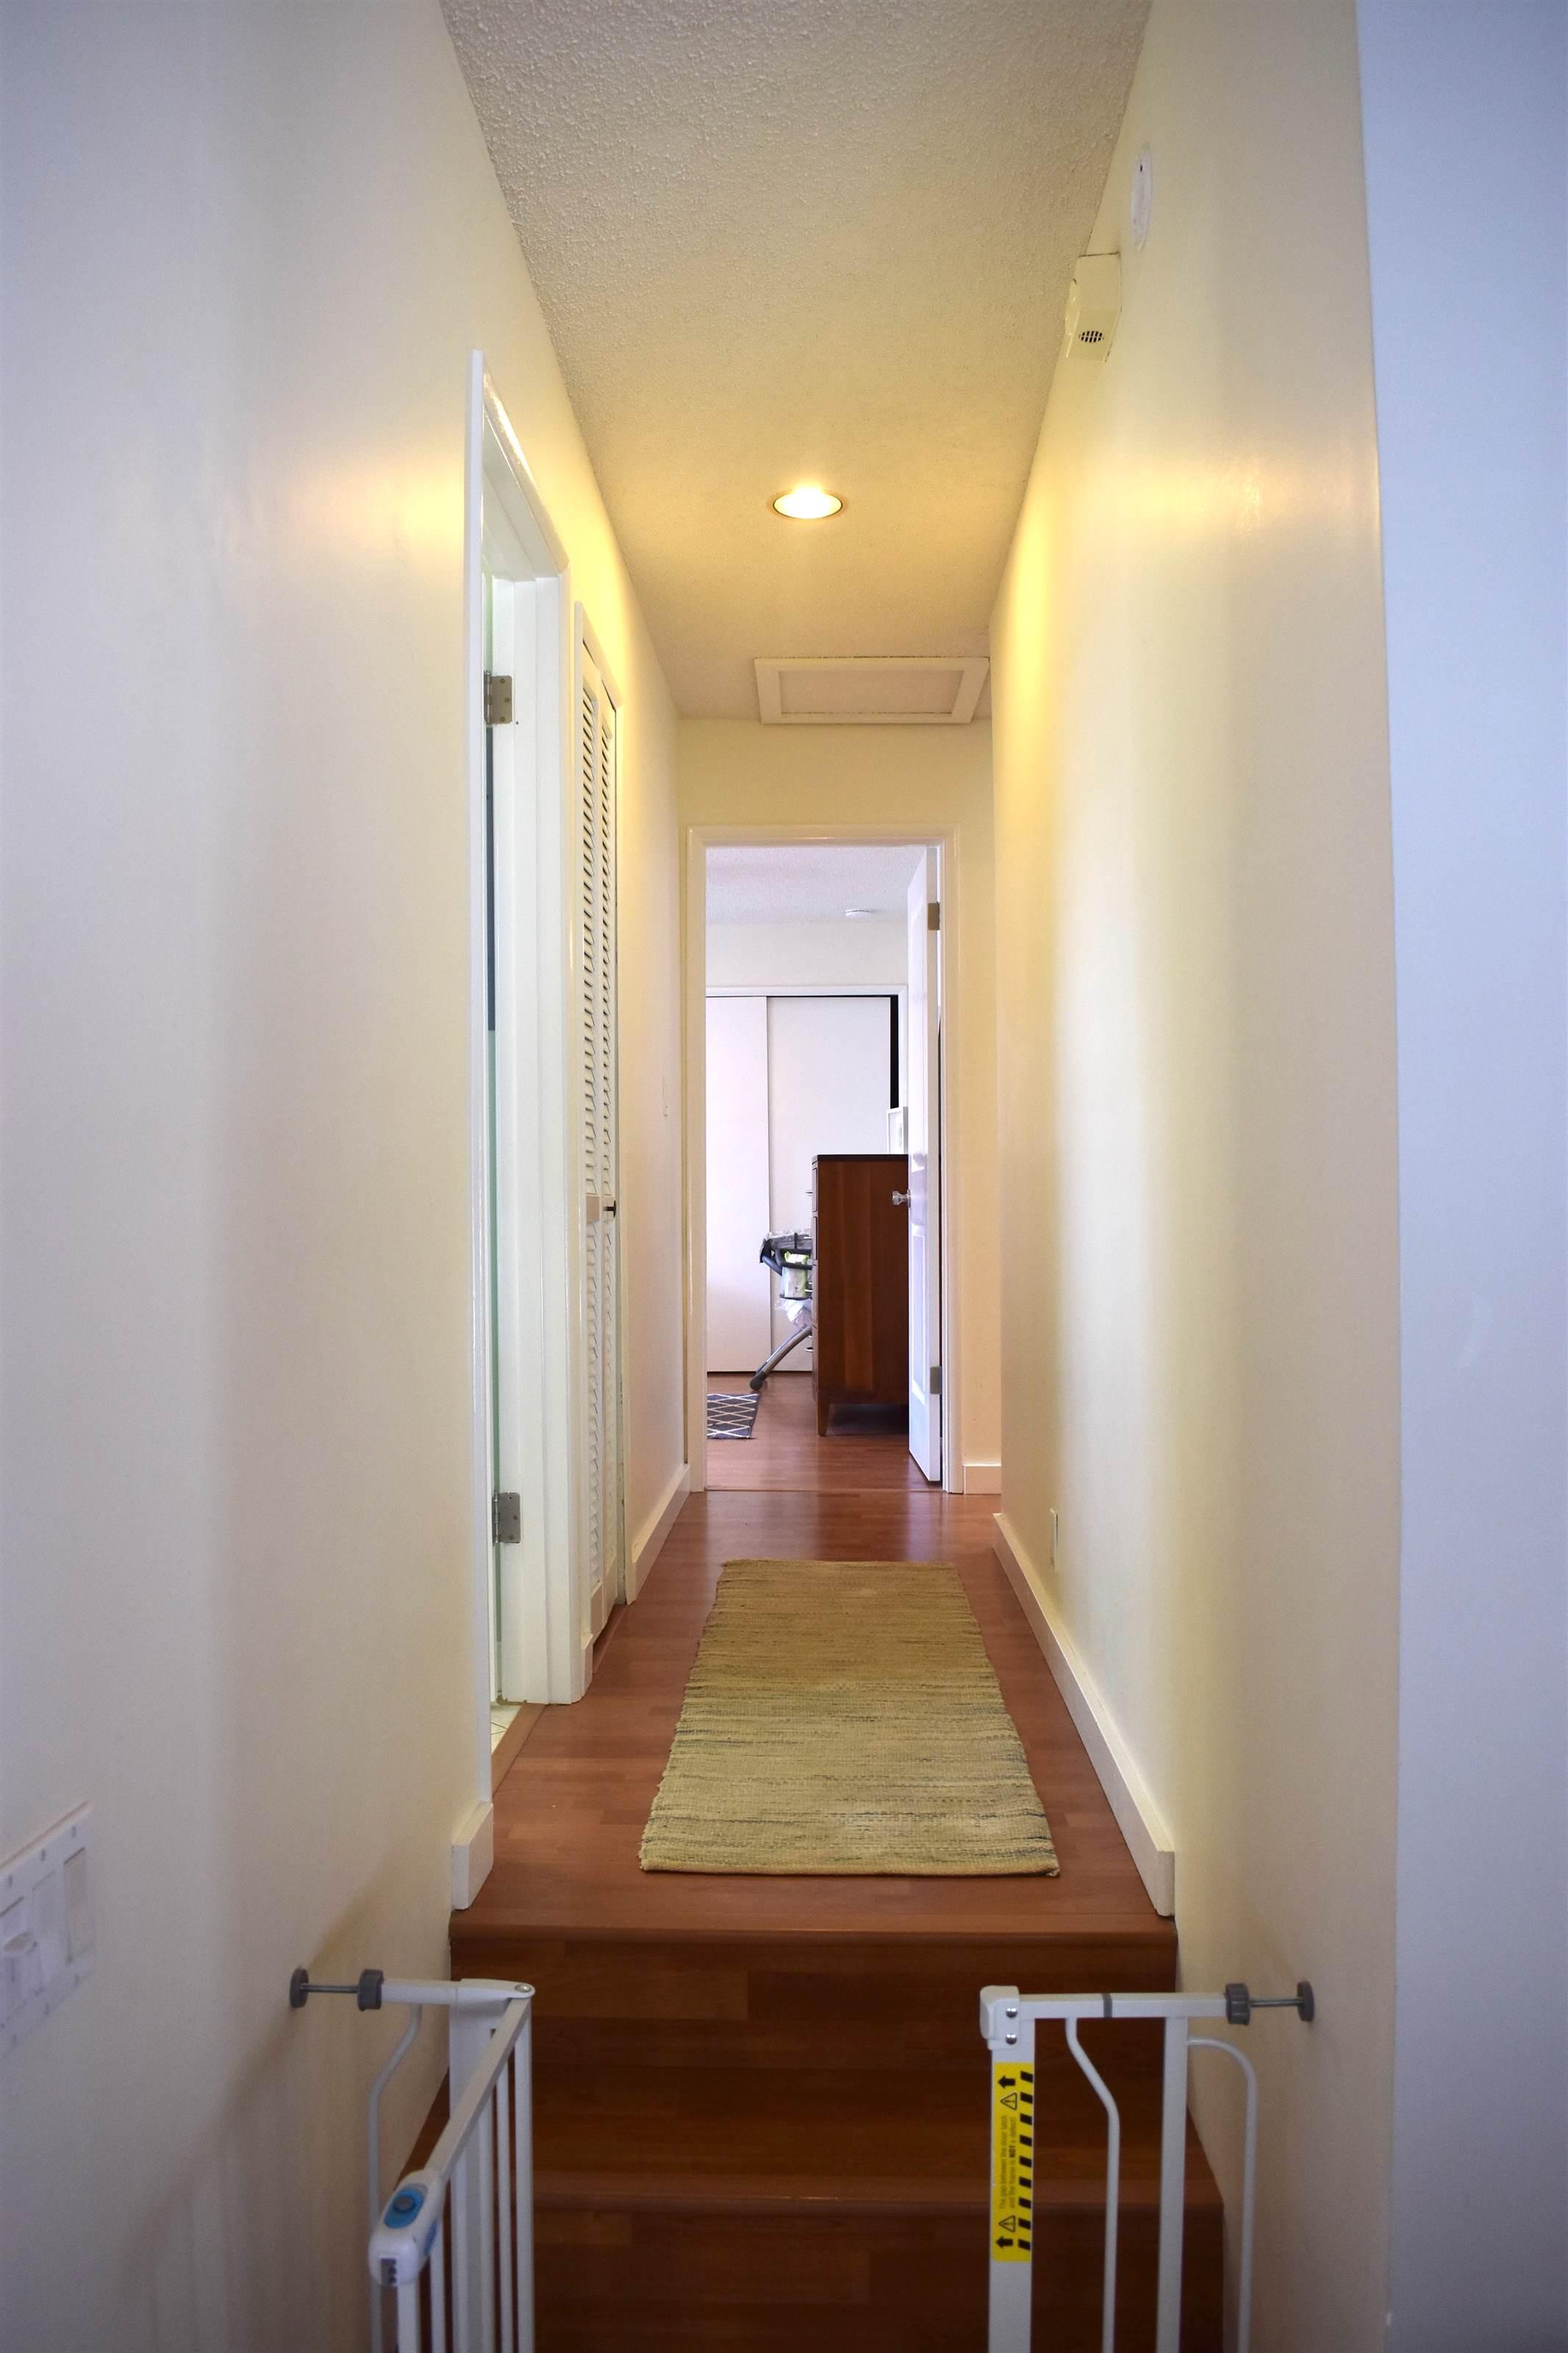 179A Kaeleloi Place #13B, Honolulu, HI 96821